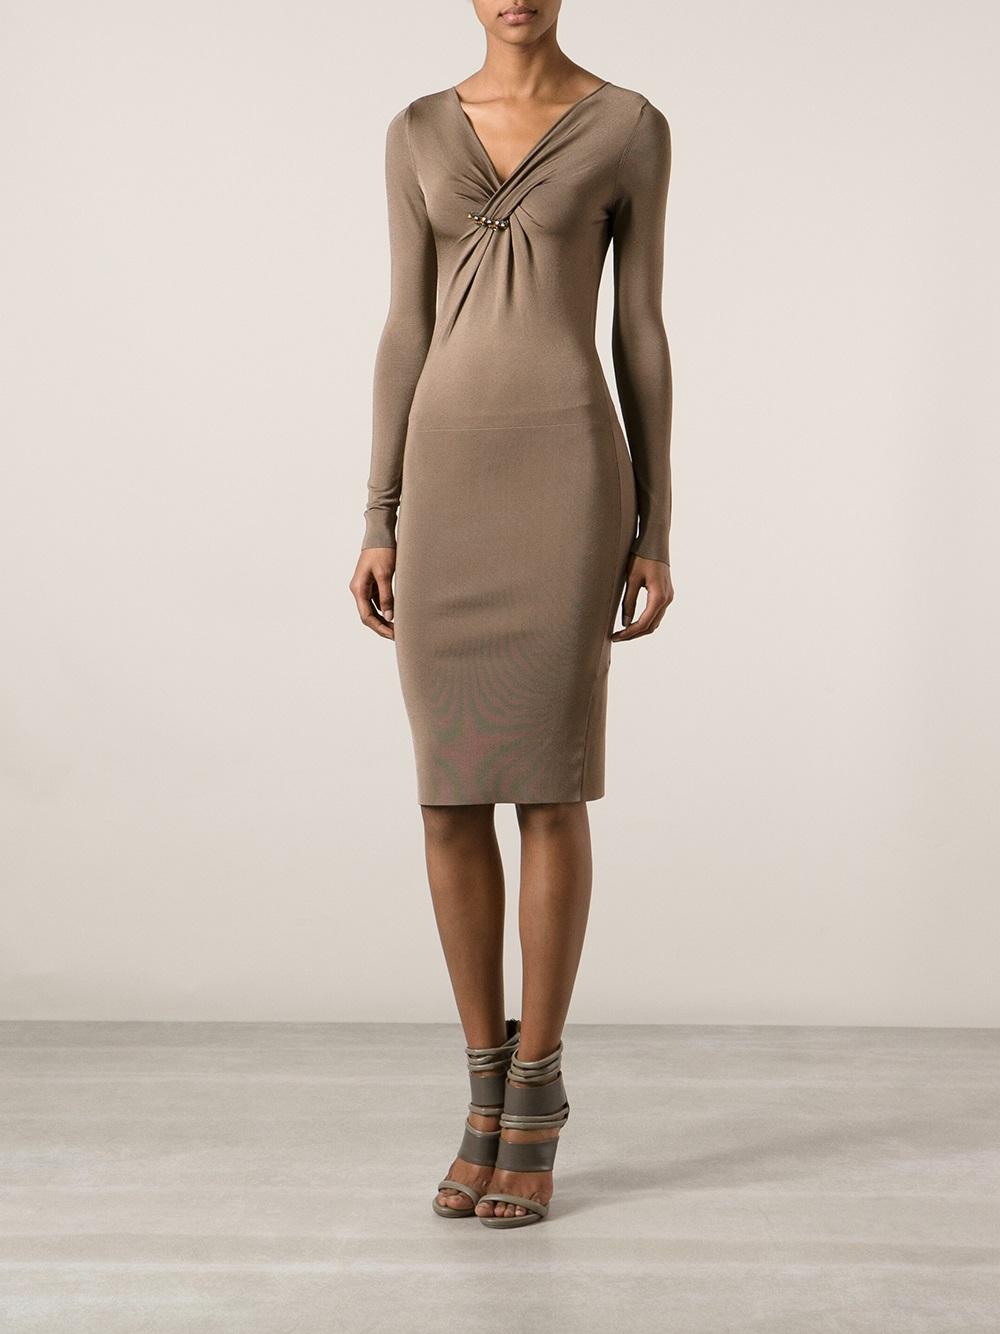 Gucci Bodycon Dress In Brown Lyst